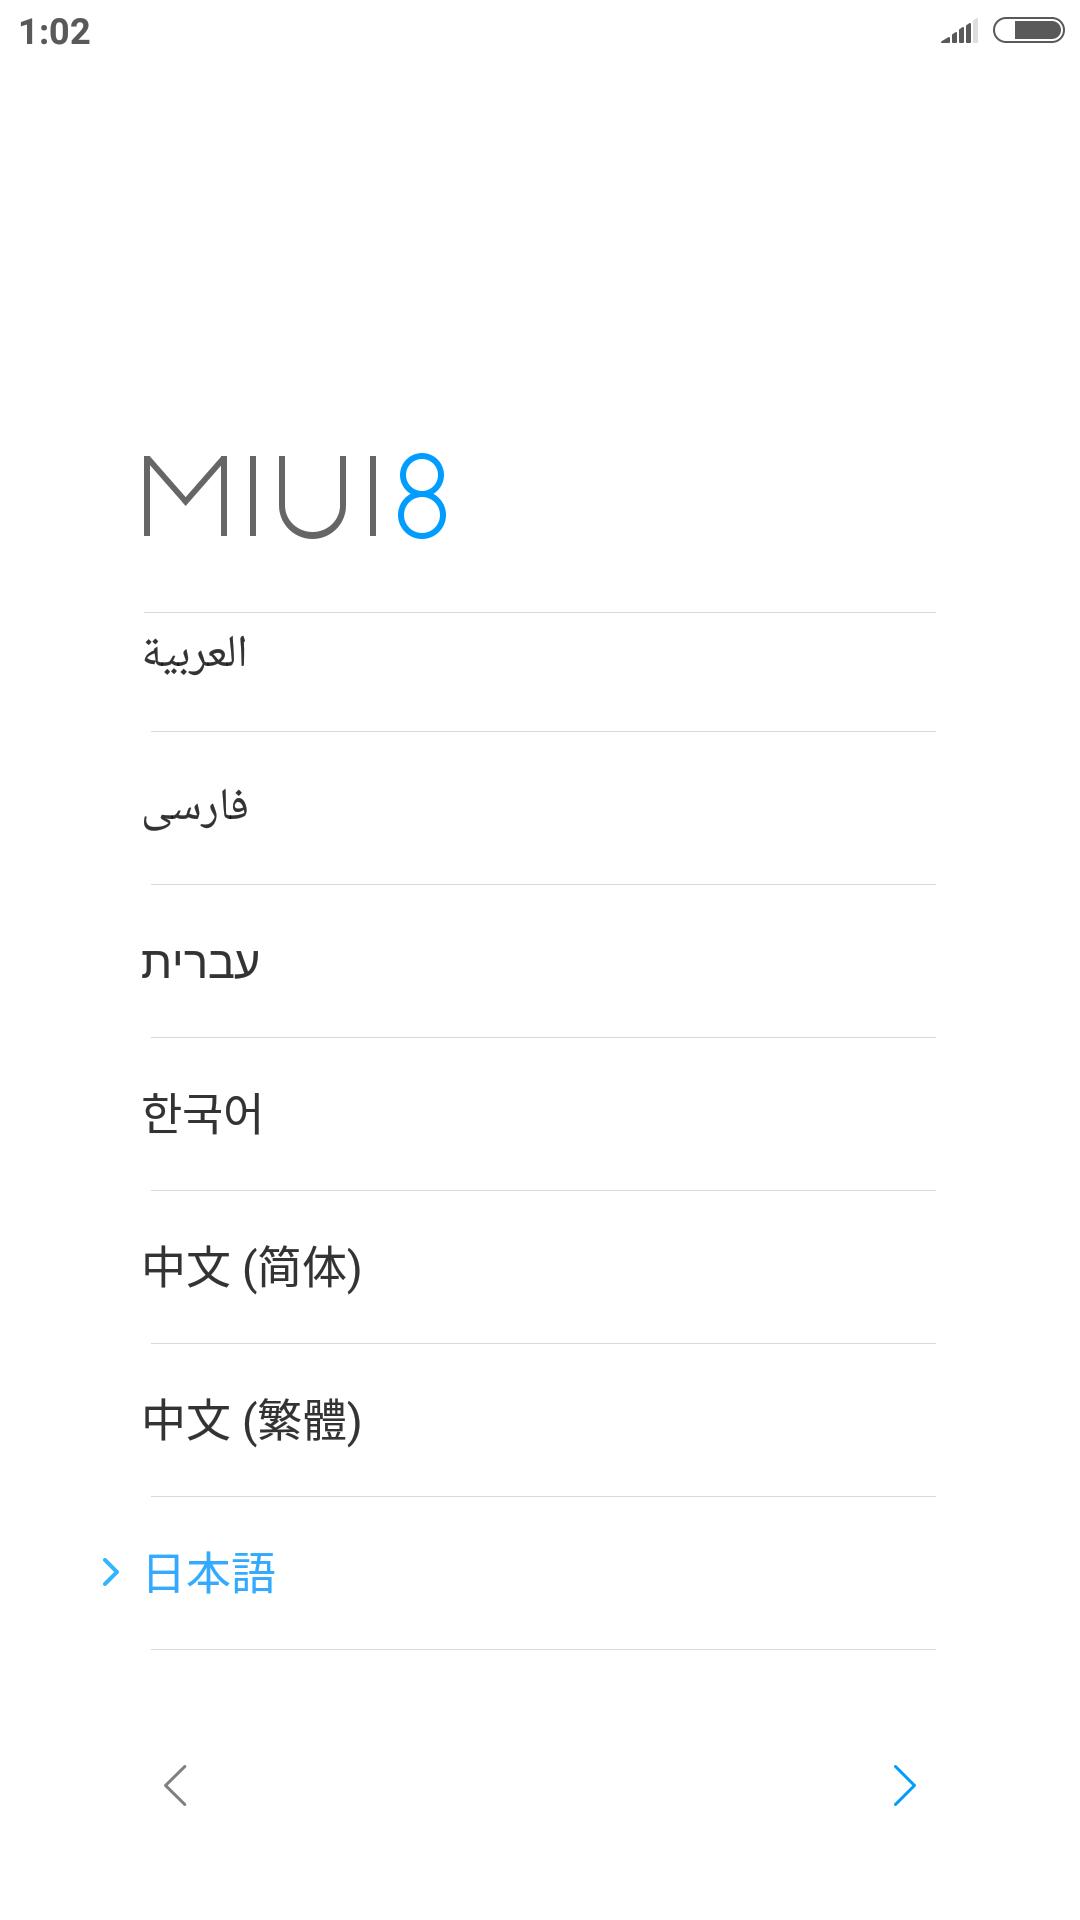 Xiaomi redmi note3 pro ECRMod MIUI8ベースの日本語カスタムROMを焼いてみた